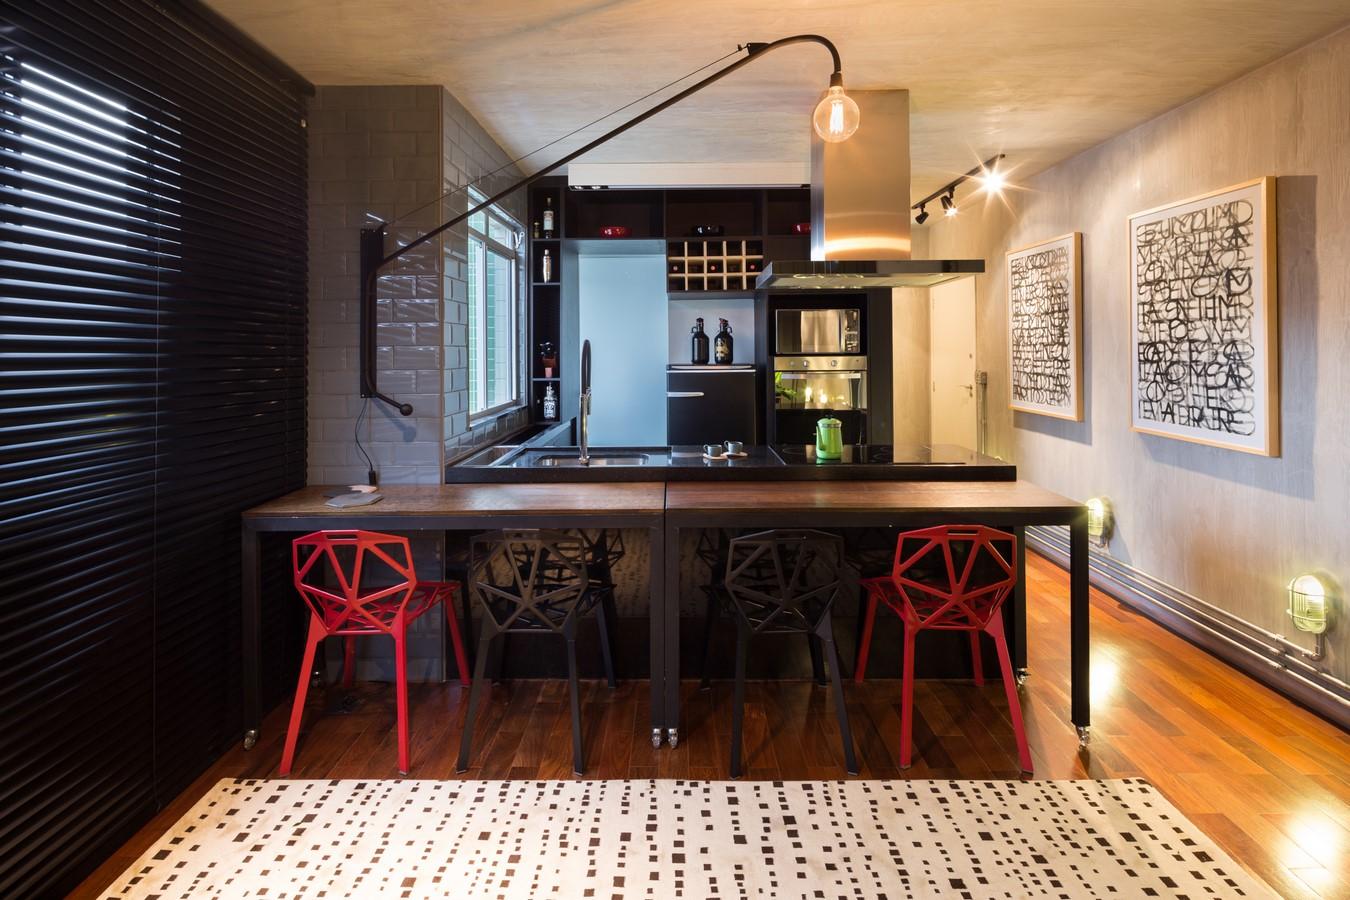 Apartamento Buritis by Pedro Haruf Arquiteto - Sheet2